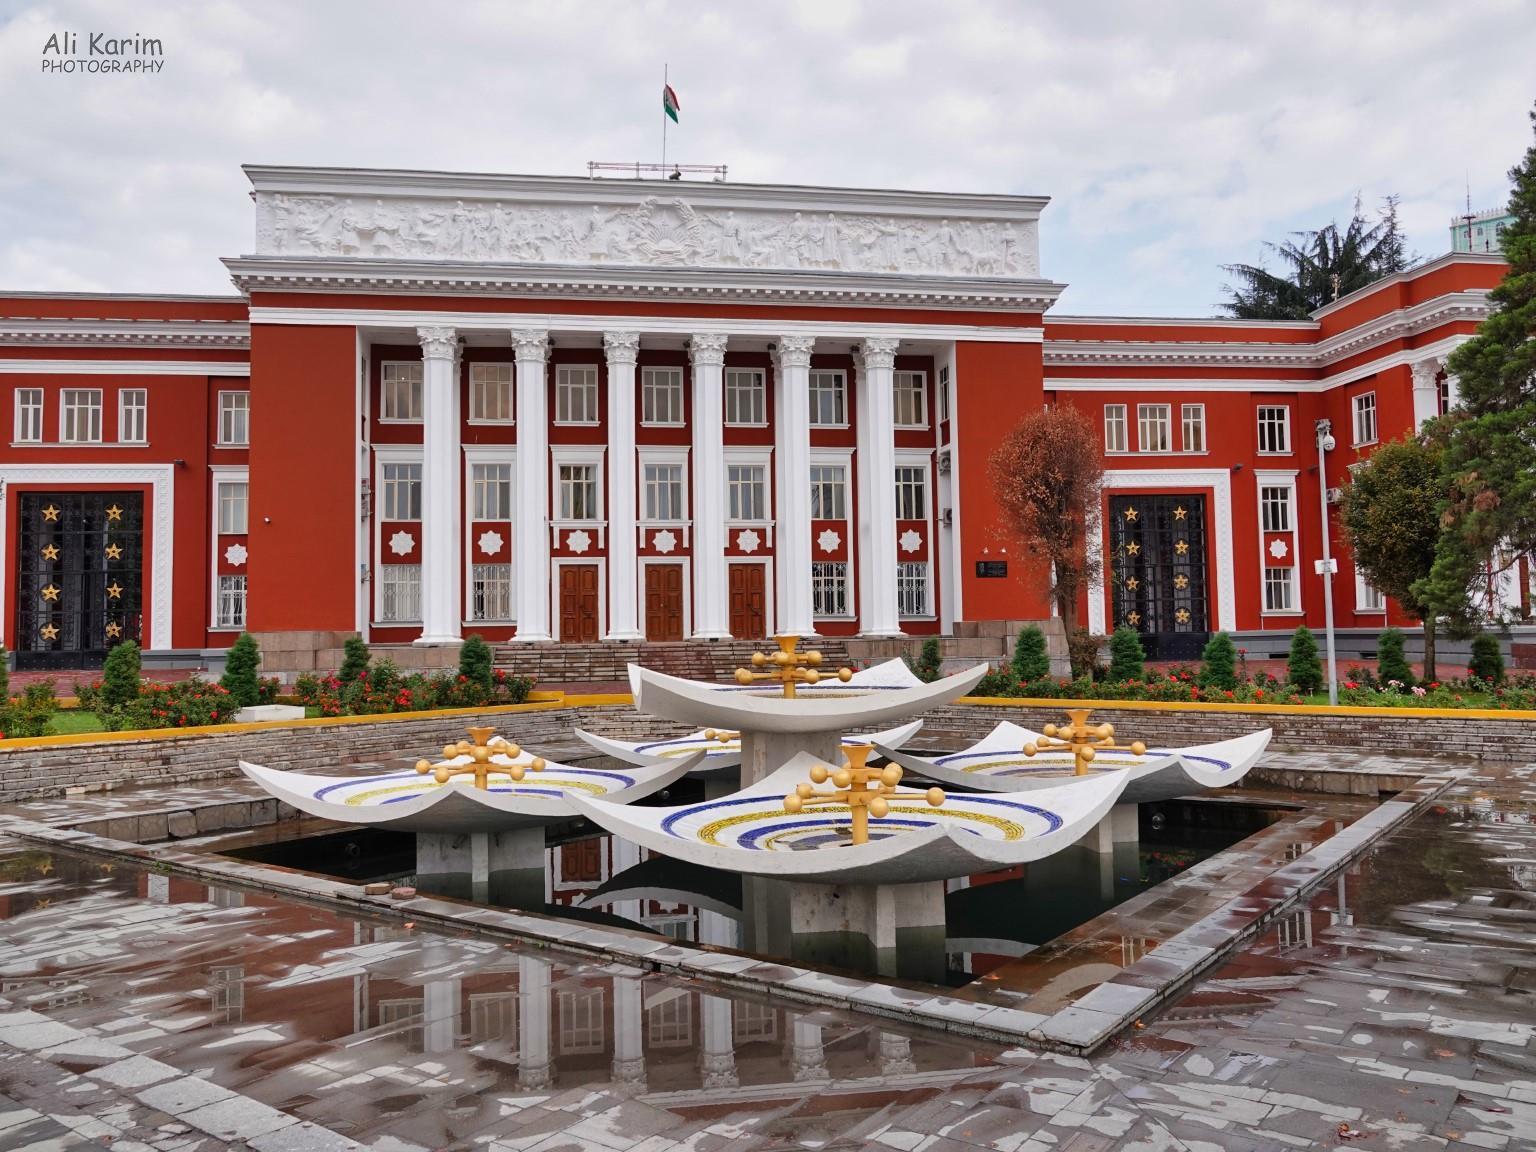 More Dushanbe, Tajikistan Parliament buildings